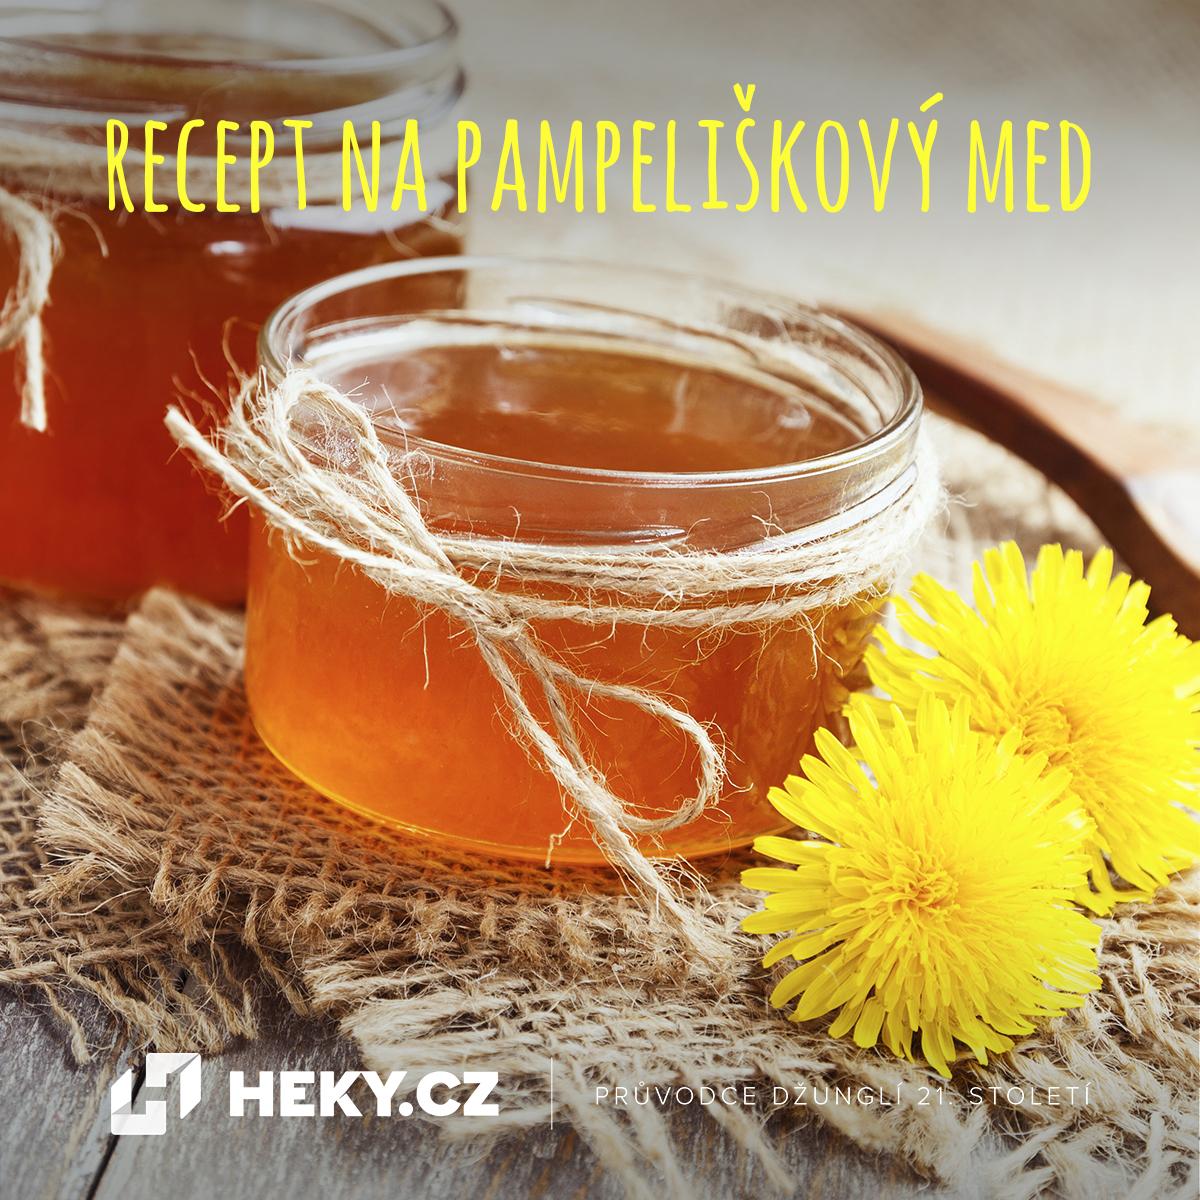 Uvařte si pampeliškový med